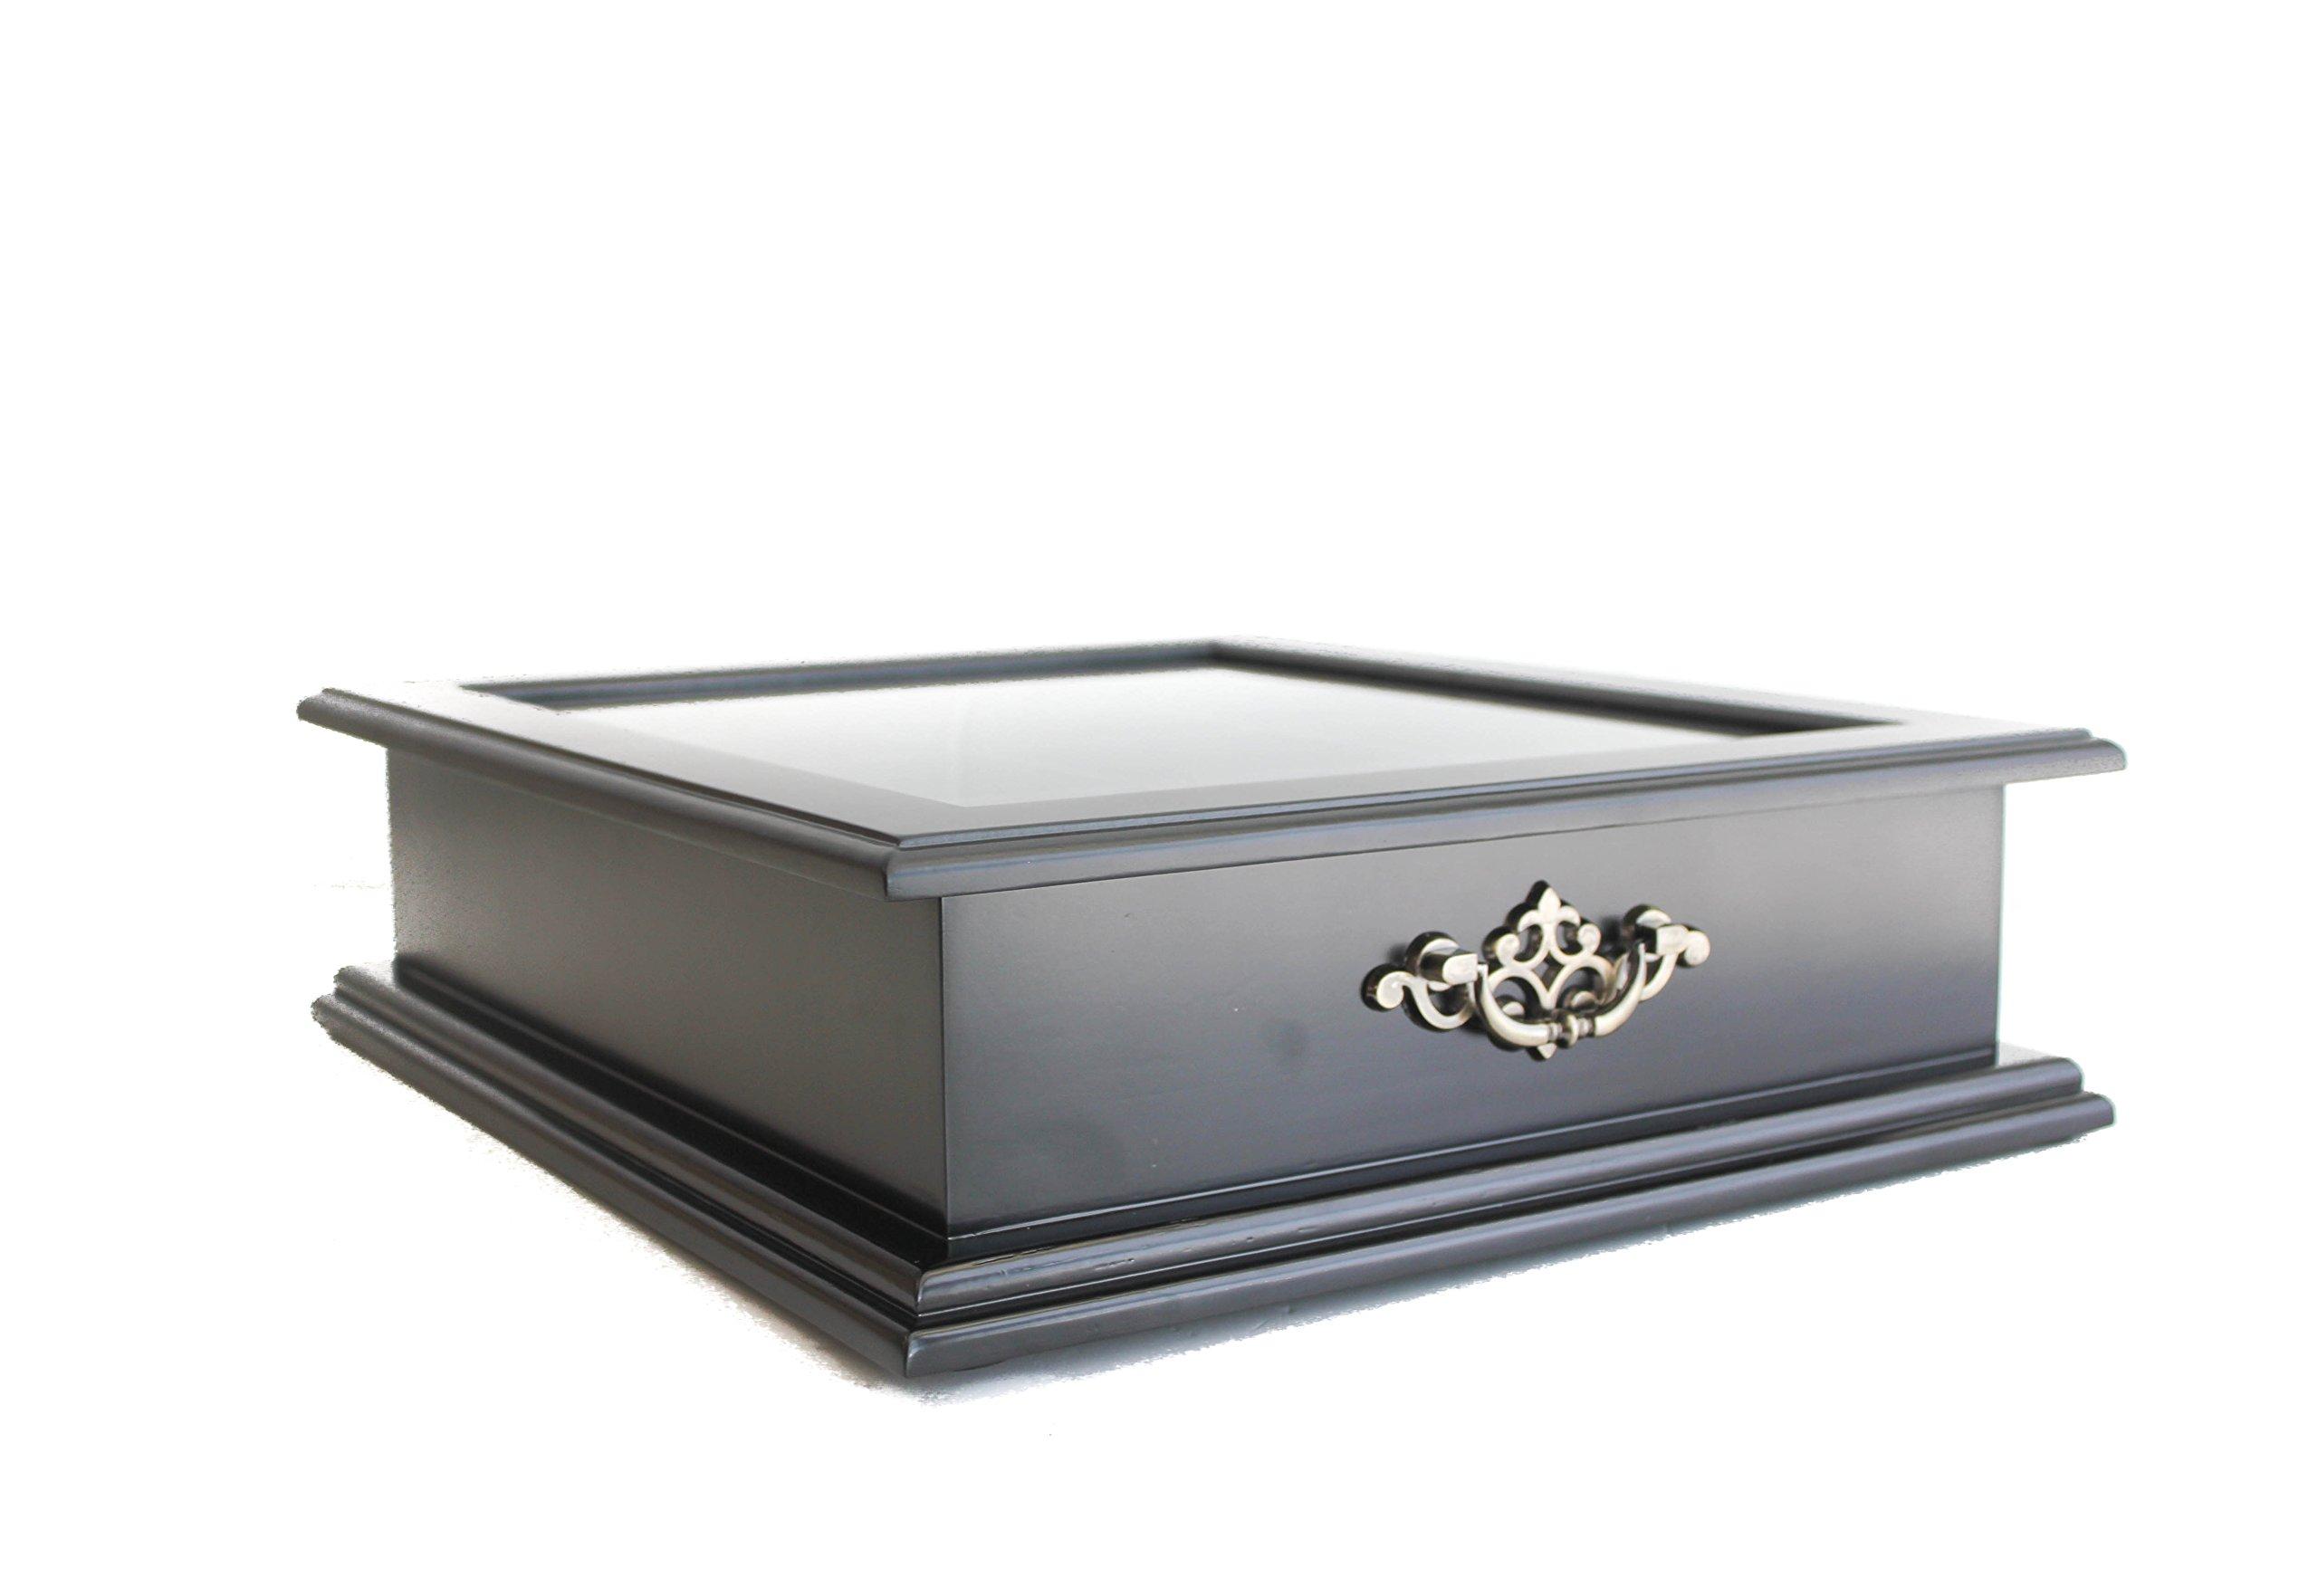 Large Tea Bag Chest Cabinet/Tea Bag Storage Box, Solid Wood (Black Finish) by DisplayGifts (Image #1)